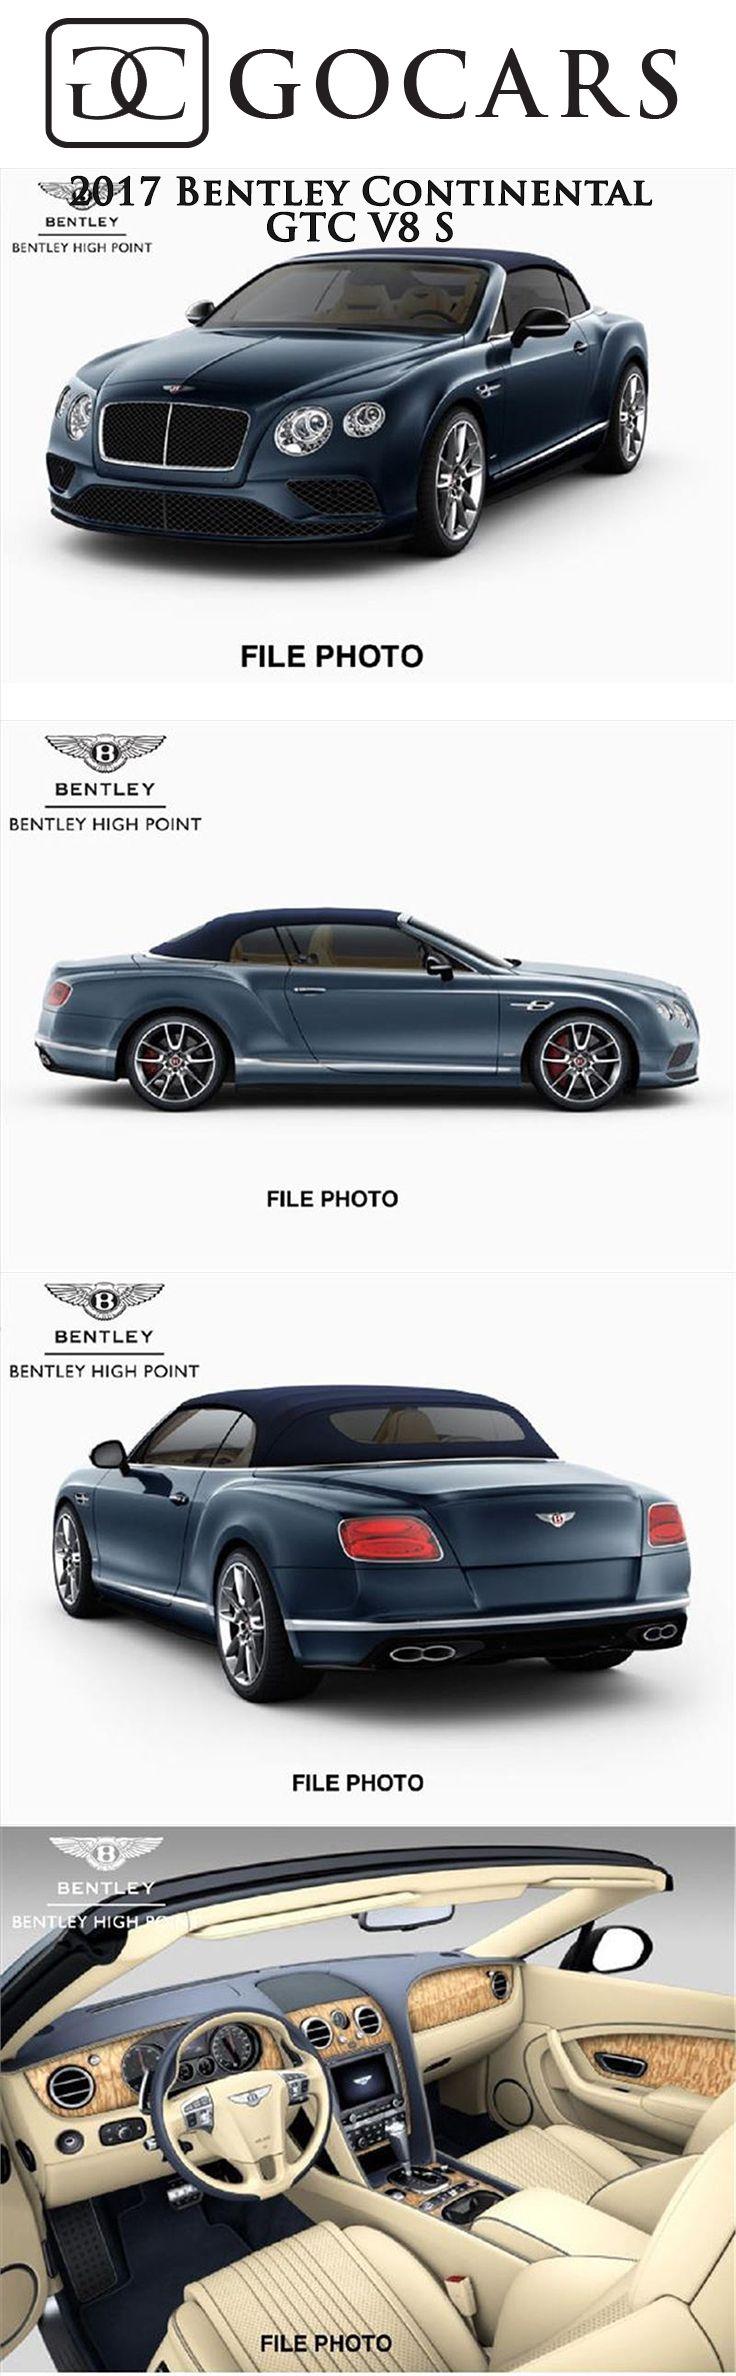 2017 Bentley Continental GTC V8 S for sale on GoCars #bentley #bentleycontinental #bentleycontinentalgtc #bentleycontinentalgtcv8s #sportscar #sportscars #supercar #supercars #luxury #luxurycars #bentleyphotos #gocars